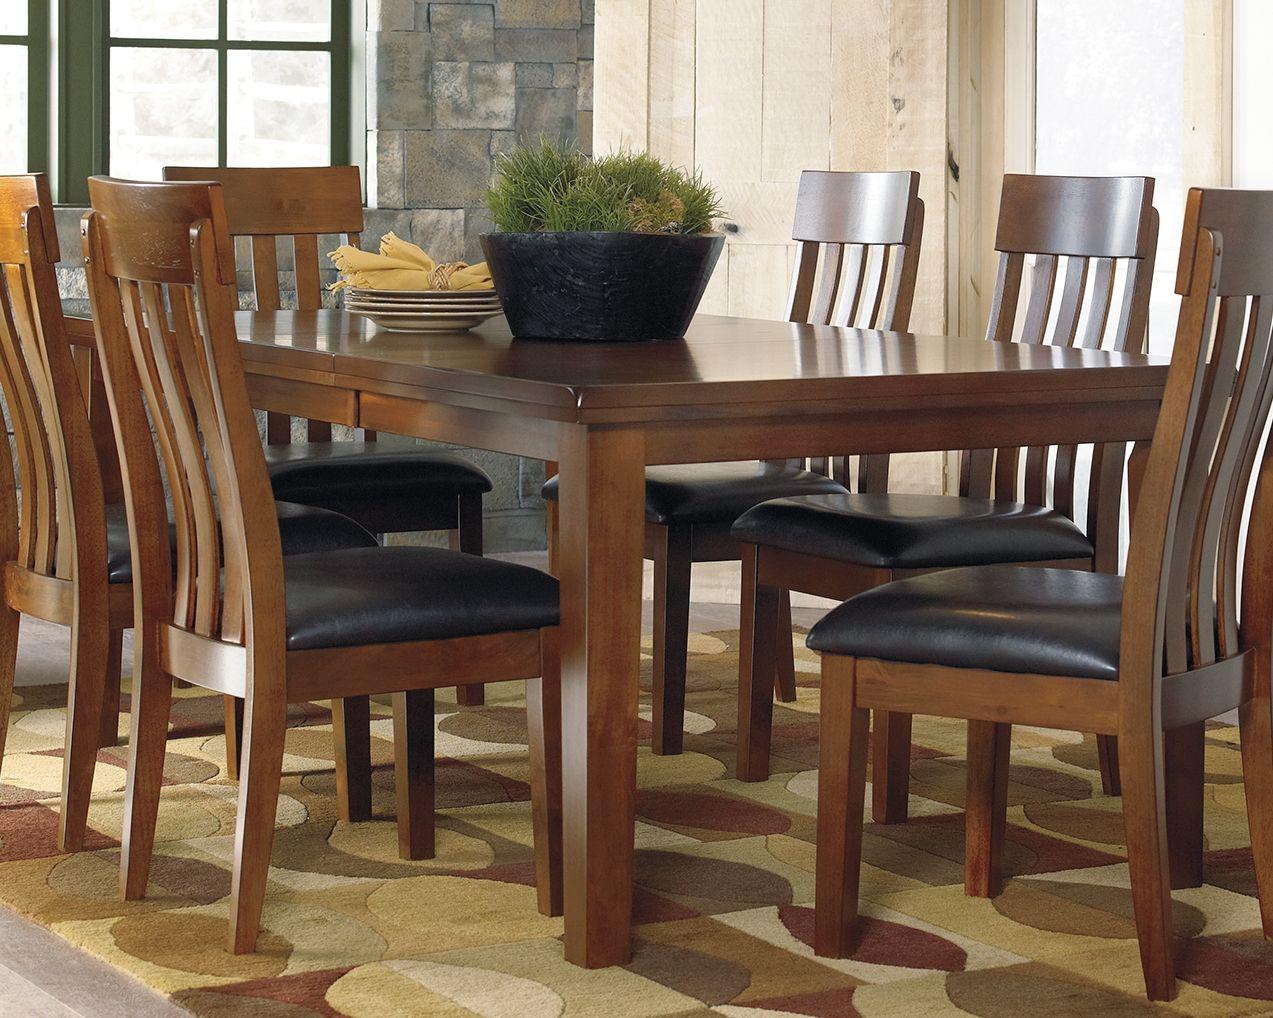 Ralene Dining Room Extension Table Medium Brown In 2020 Dining Room Sets Extension Dining Table Dining Table